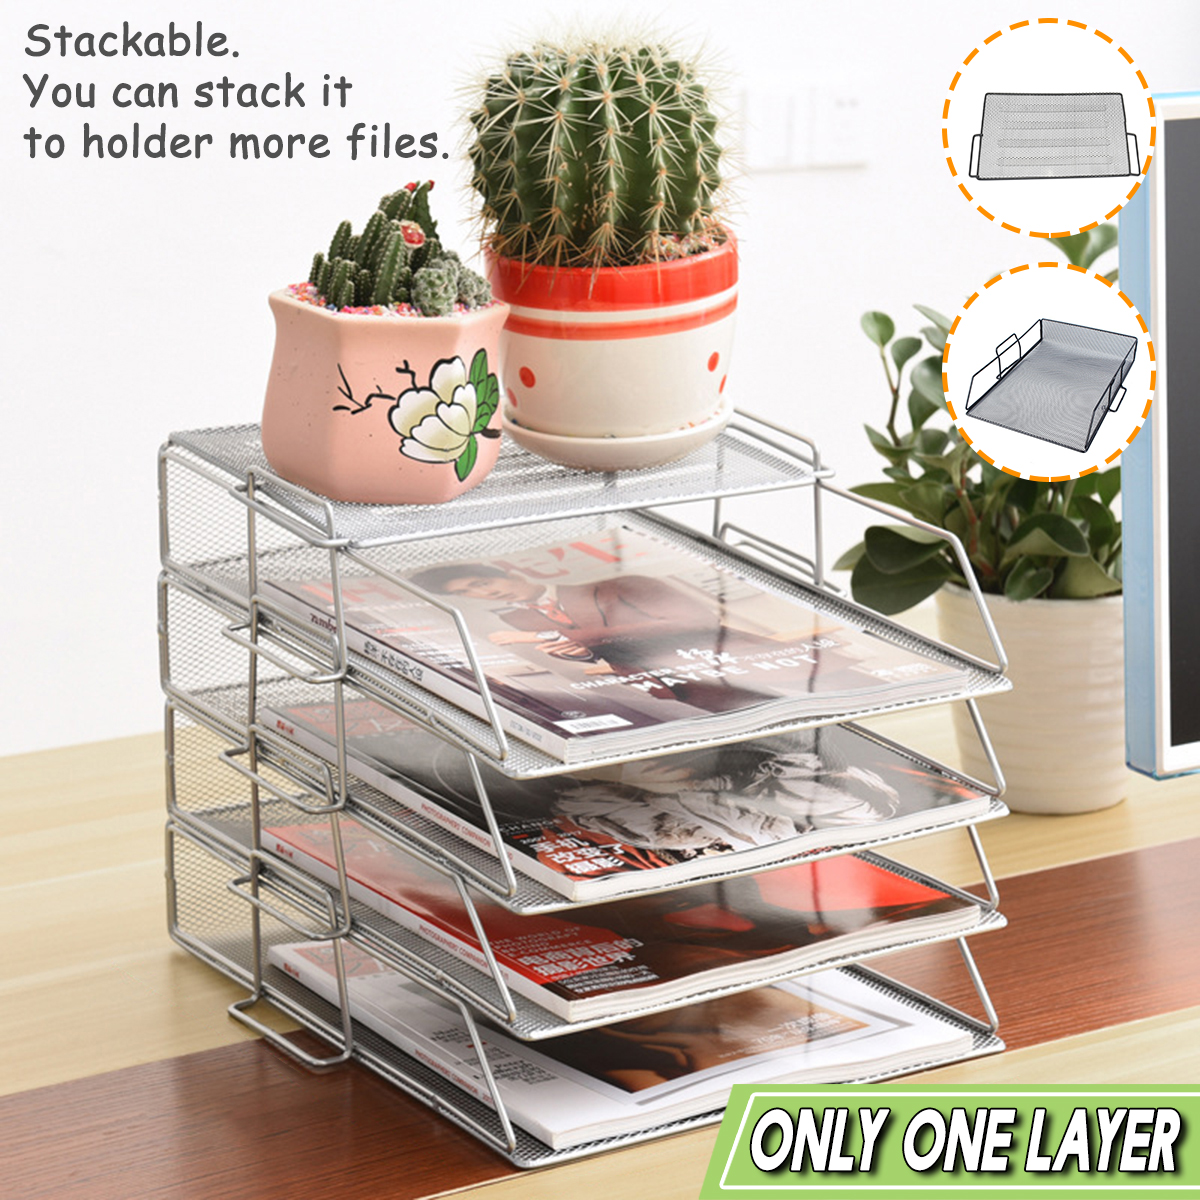 Stackable Iron Mesh A4 Paper Organizer Document File Storage Basket Holder Desktop Office Book Magazine Newspaper Storage Tray